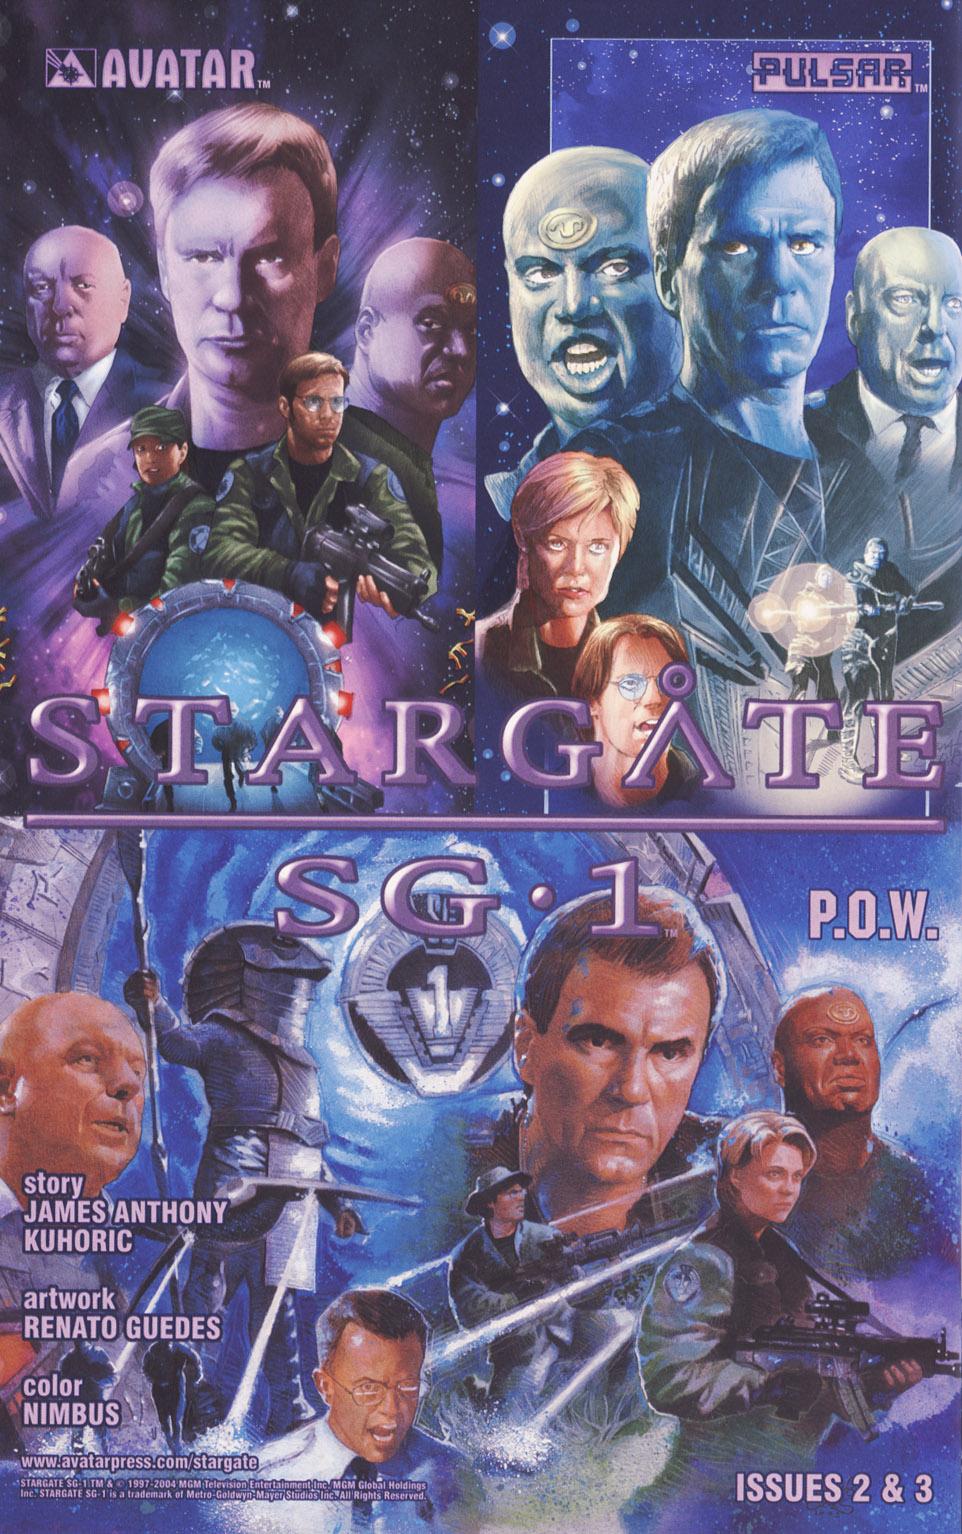 Read online Stargate SG-1: POW comic -  Issue #2 - 25